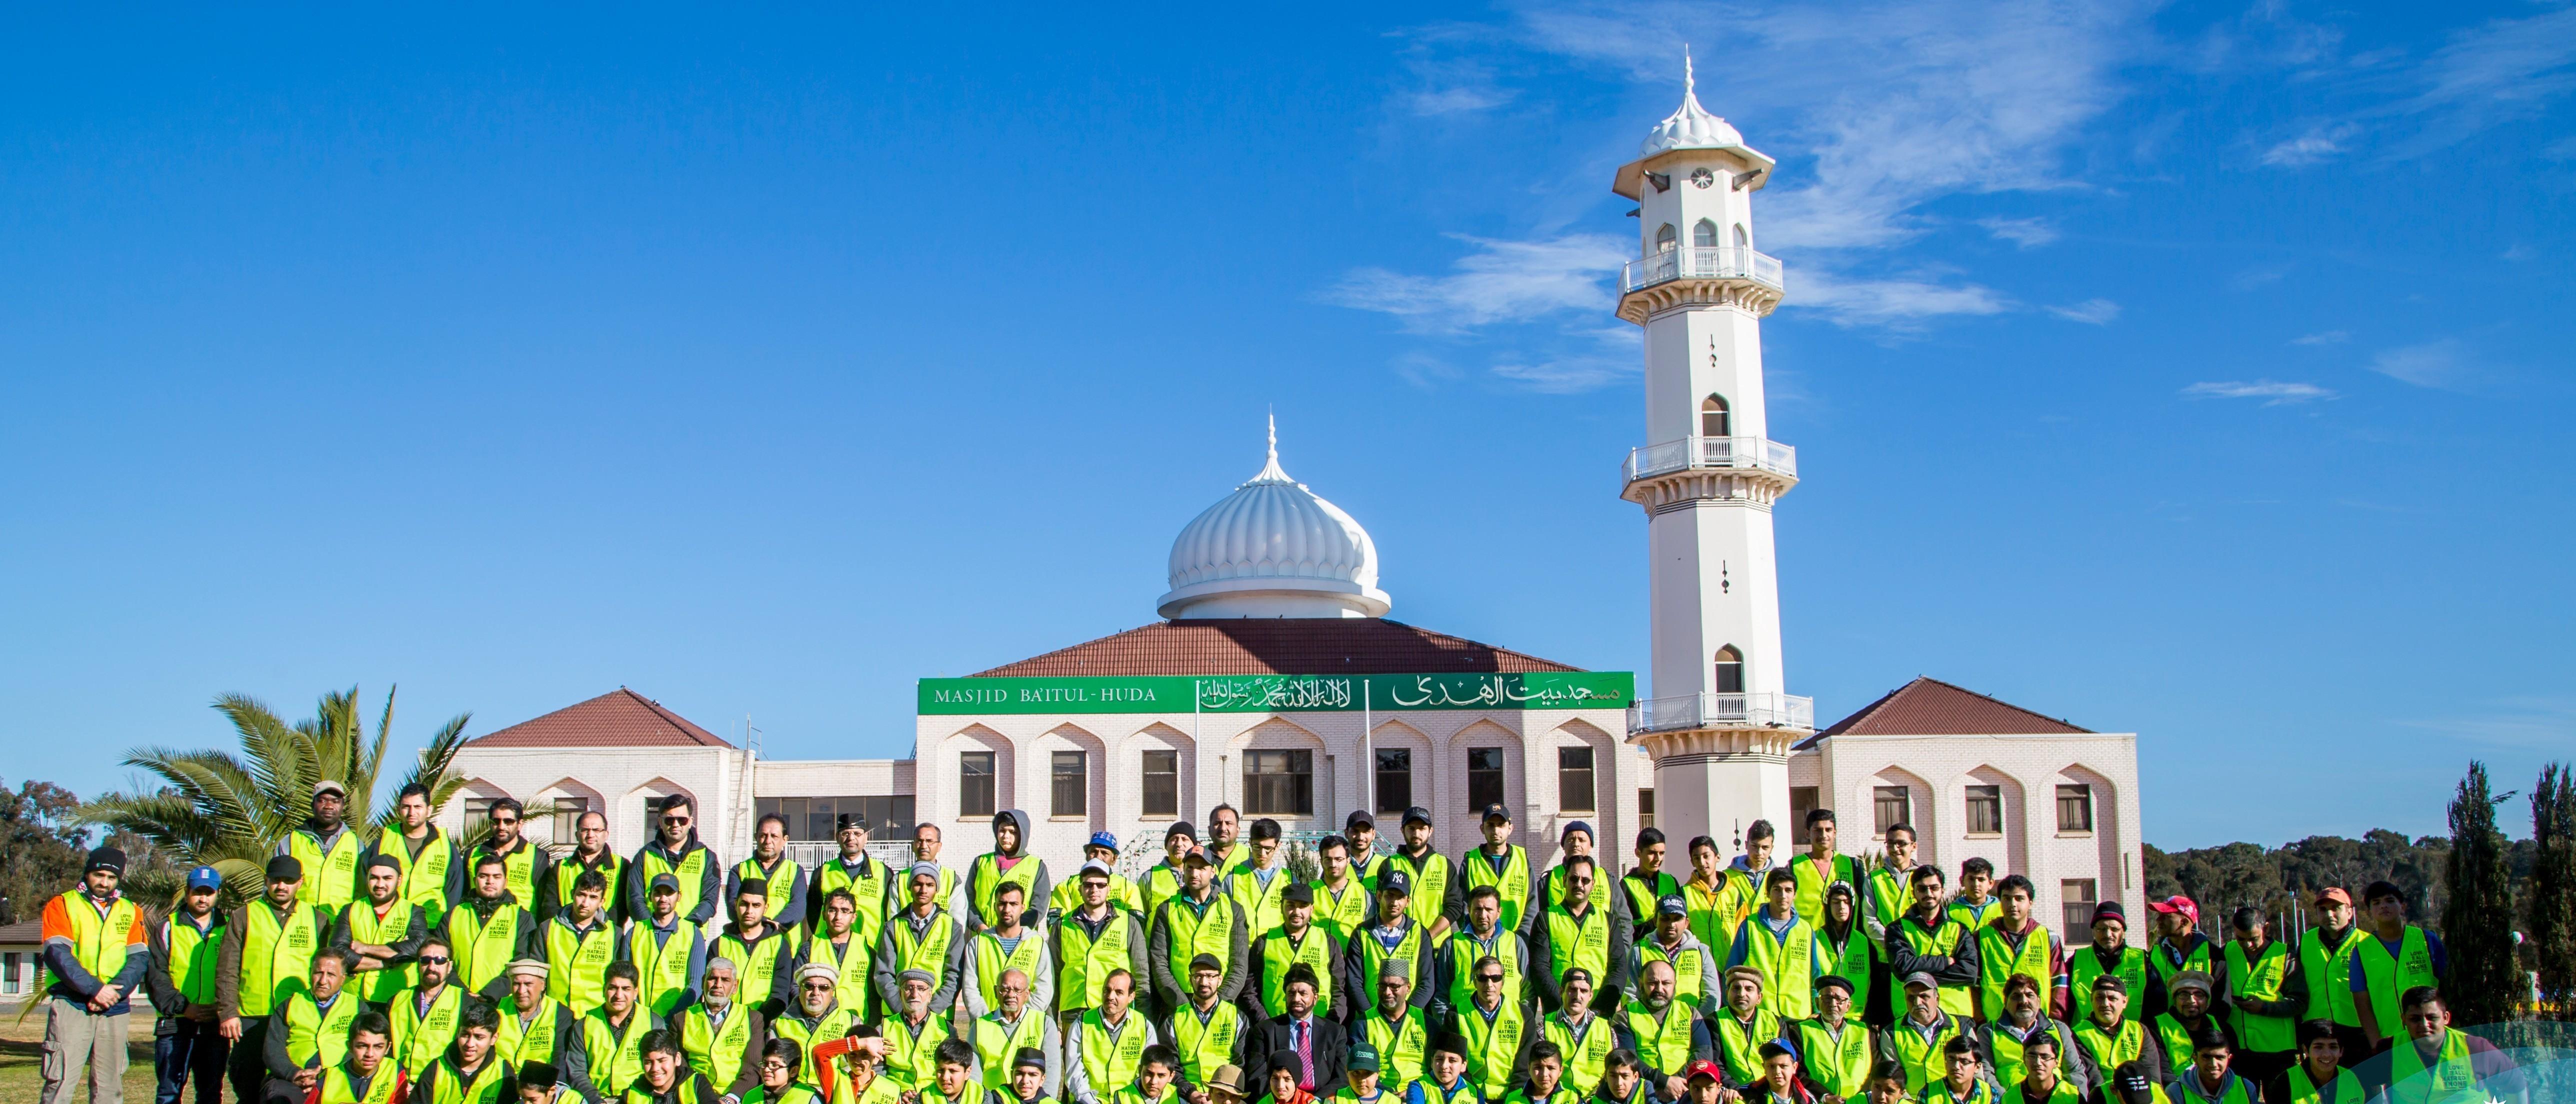 Ahmadi Muslims SA - Harbour Town Shopping Centre